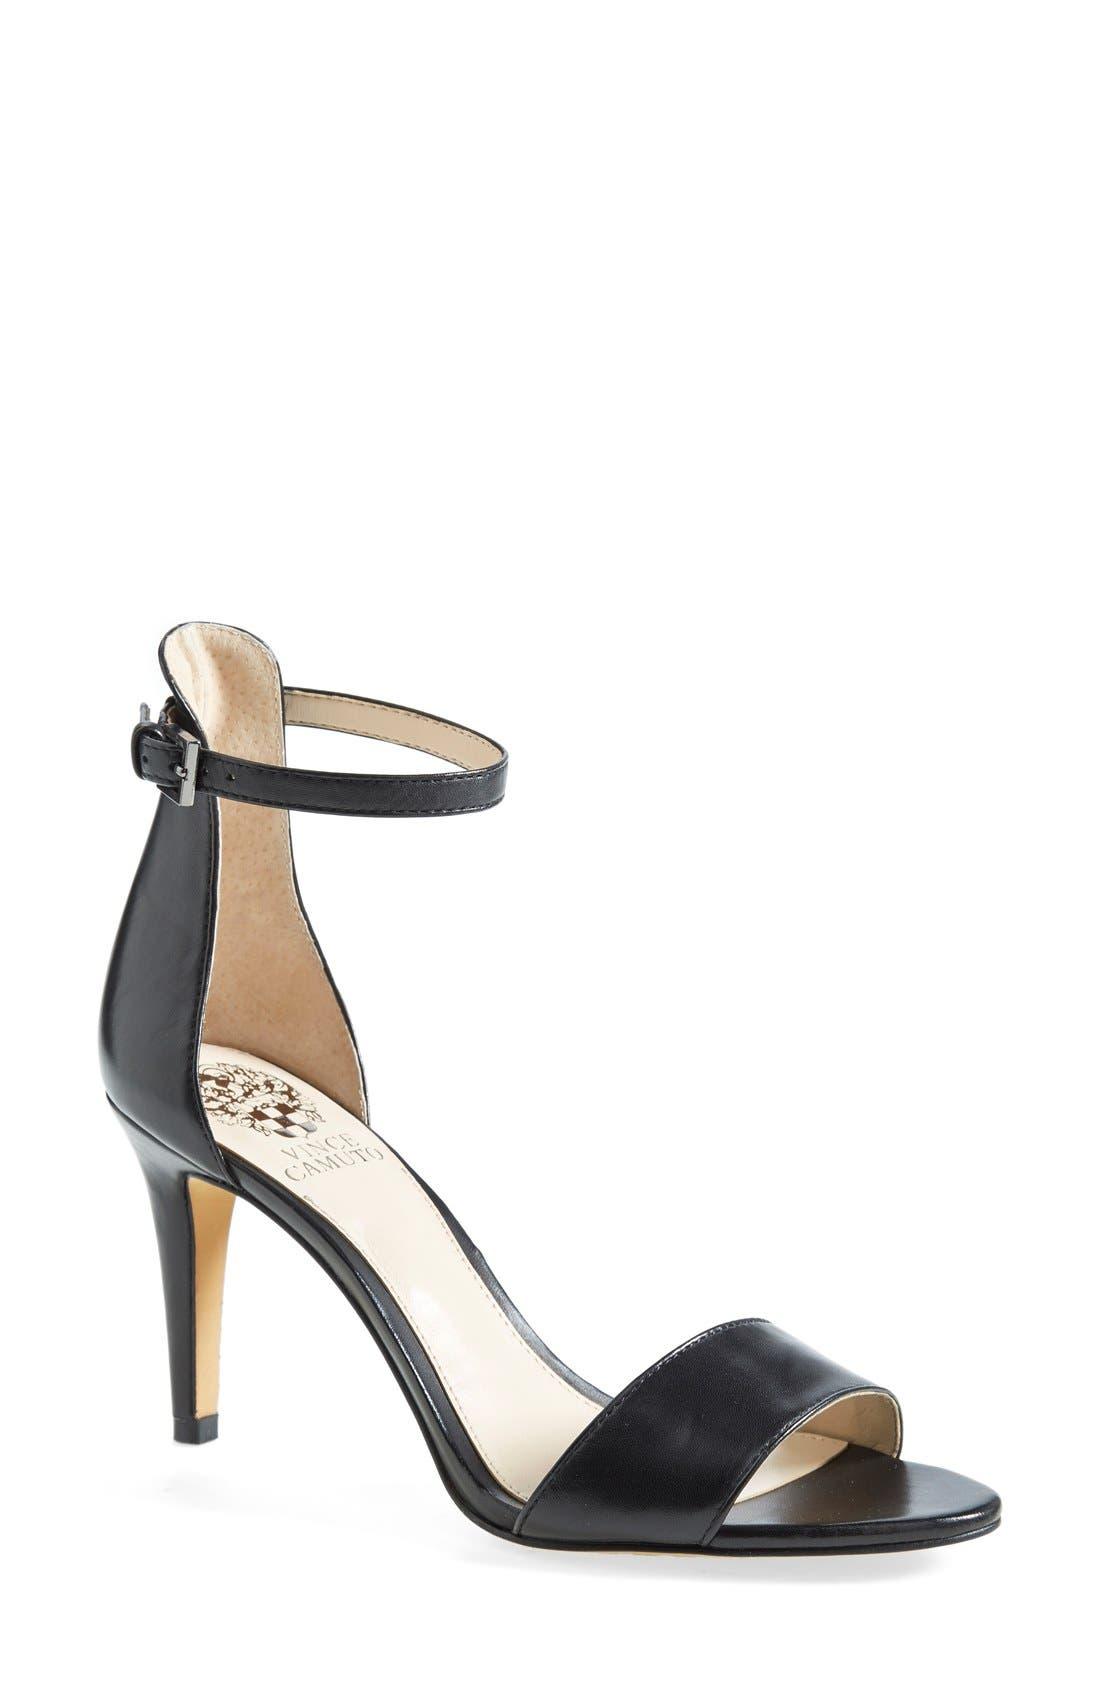 Main Image - Vince Camuto 'Court' Ankle Strap Sandal (Women)